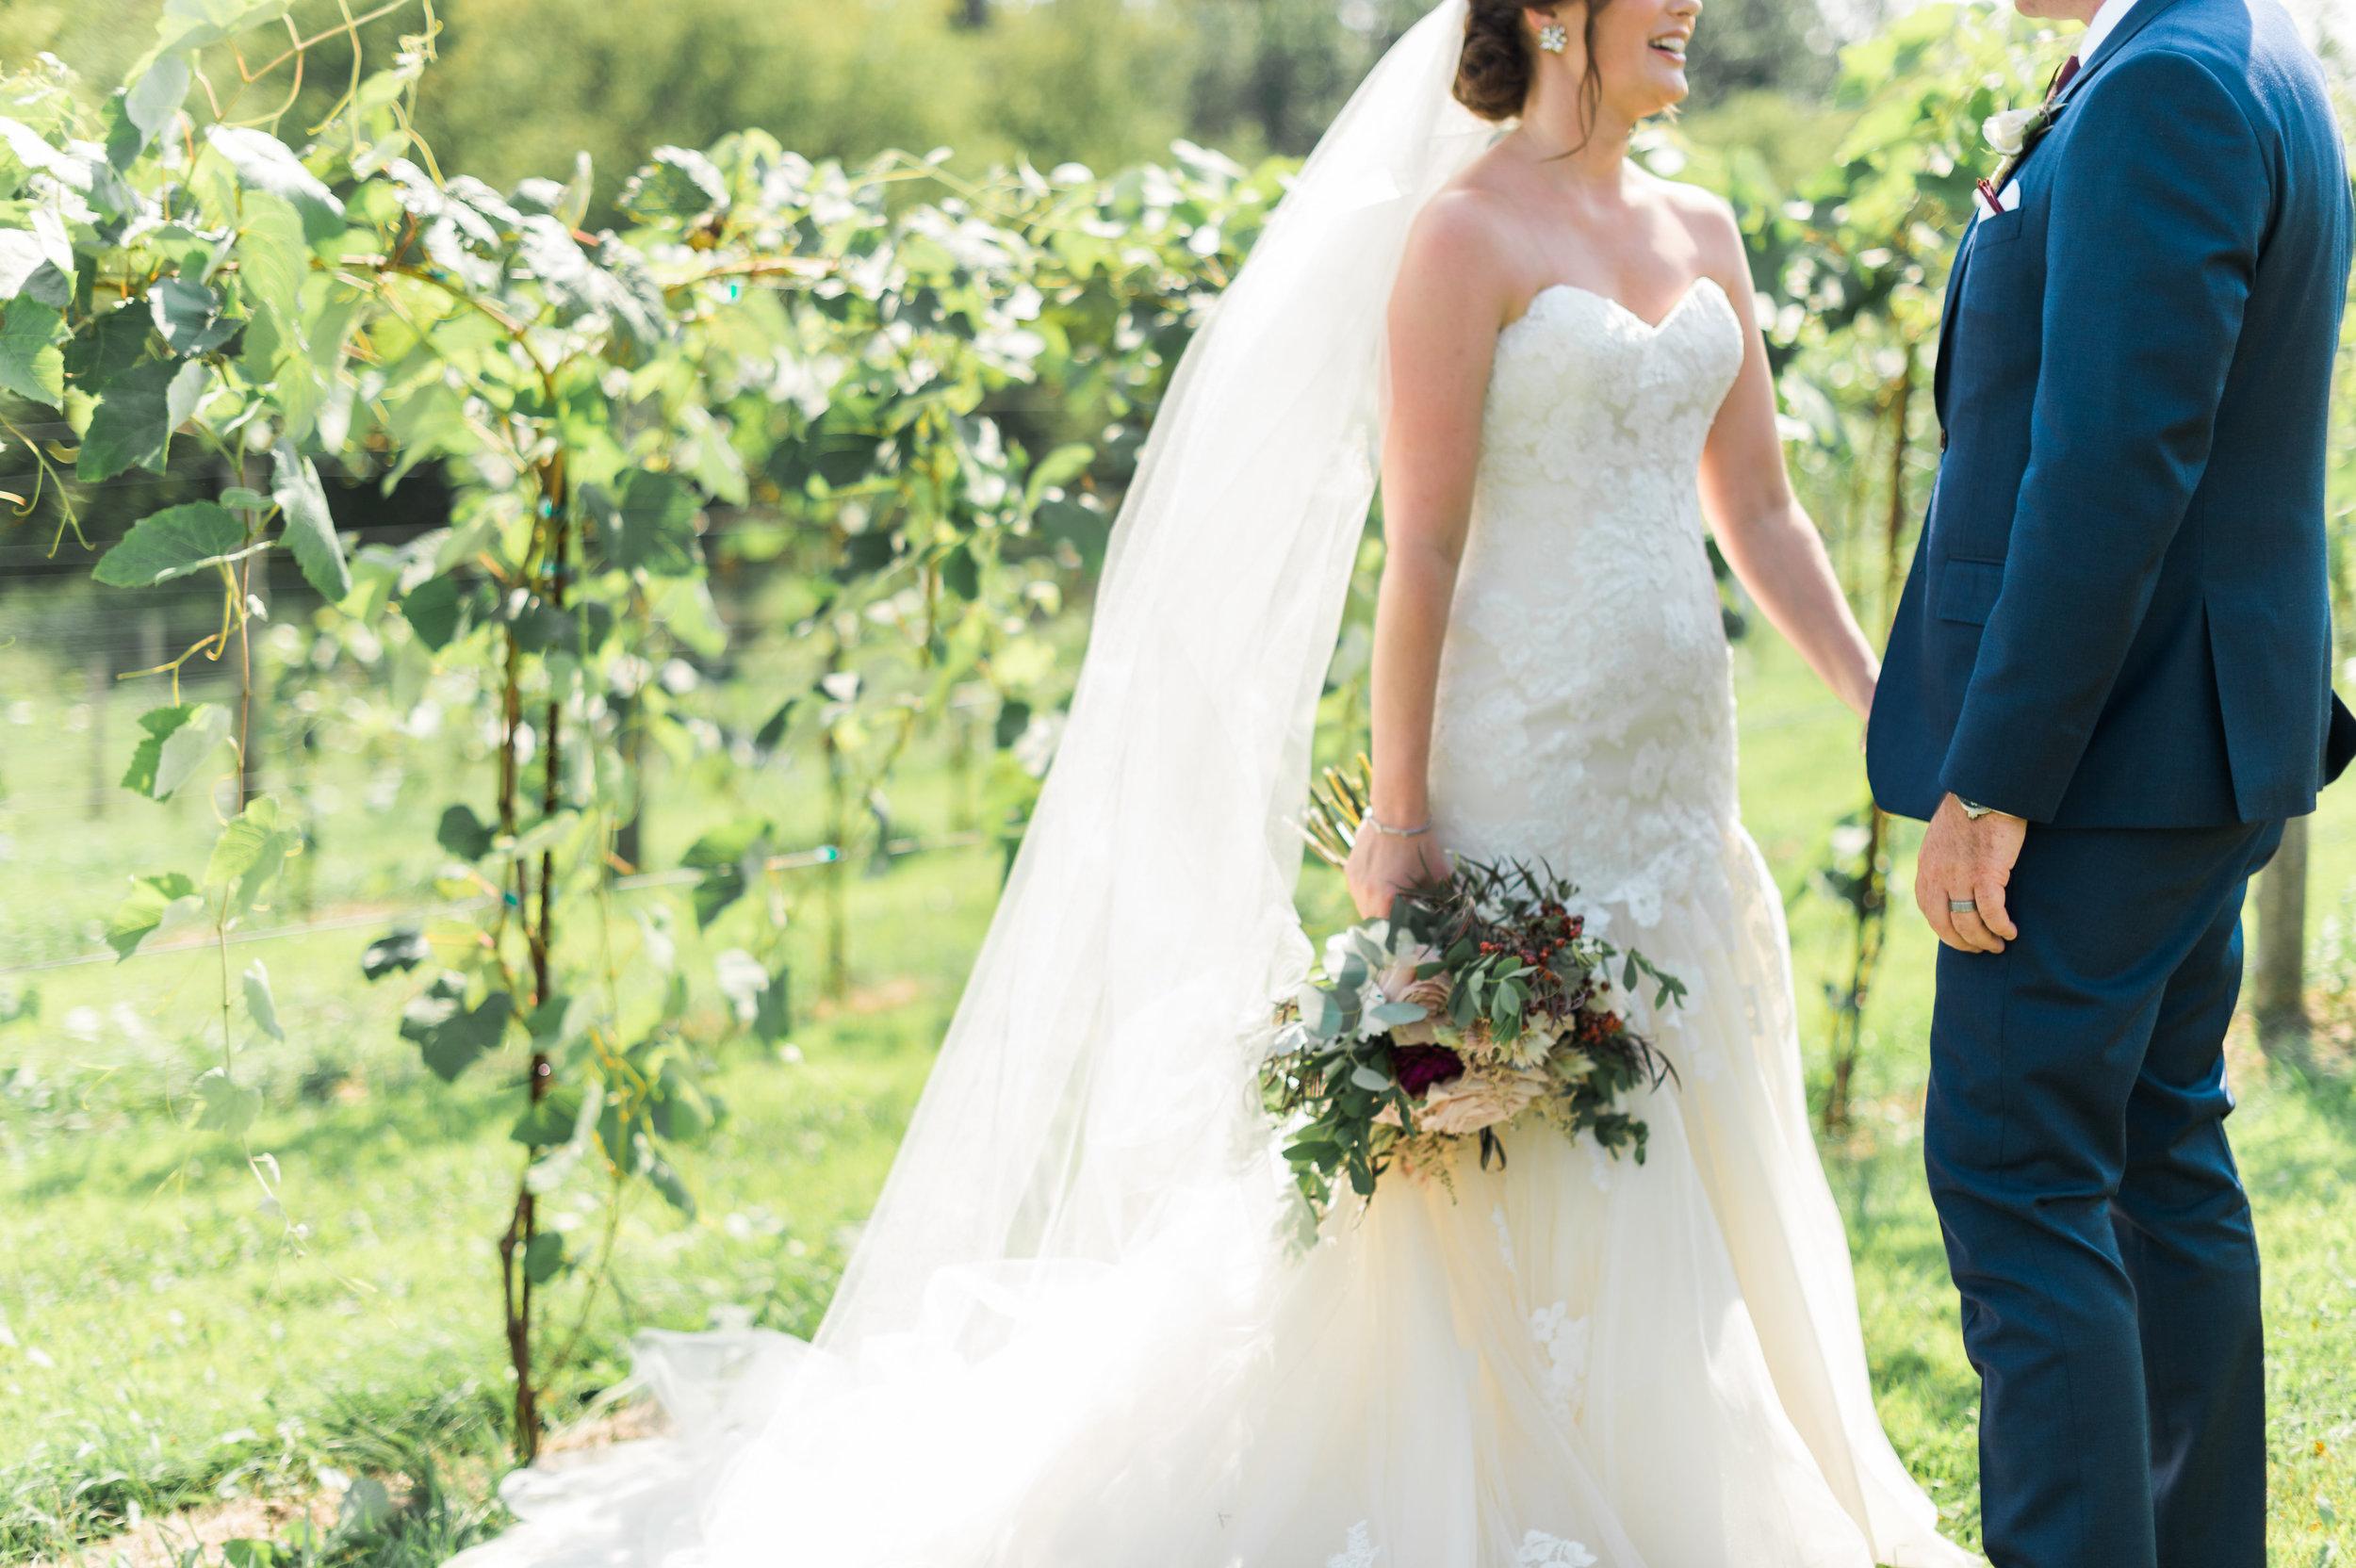 Barkalow Wedding